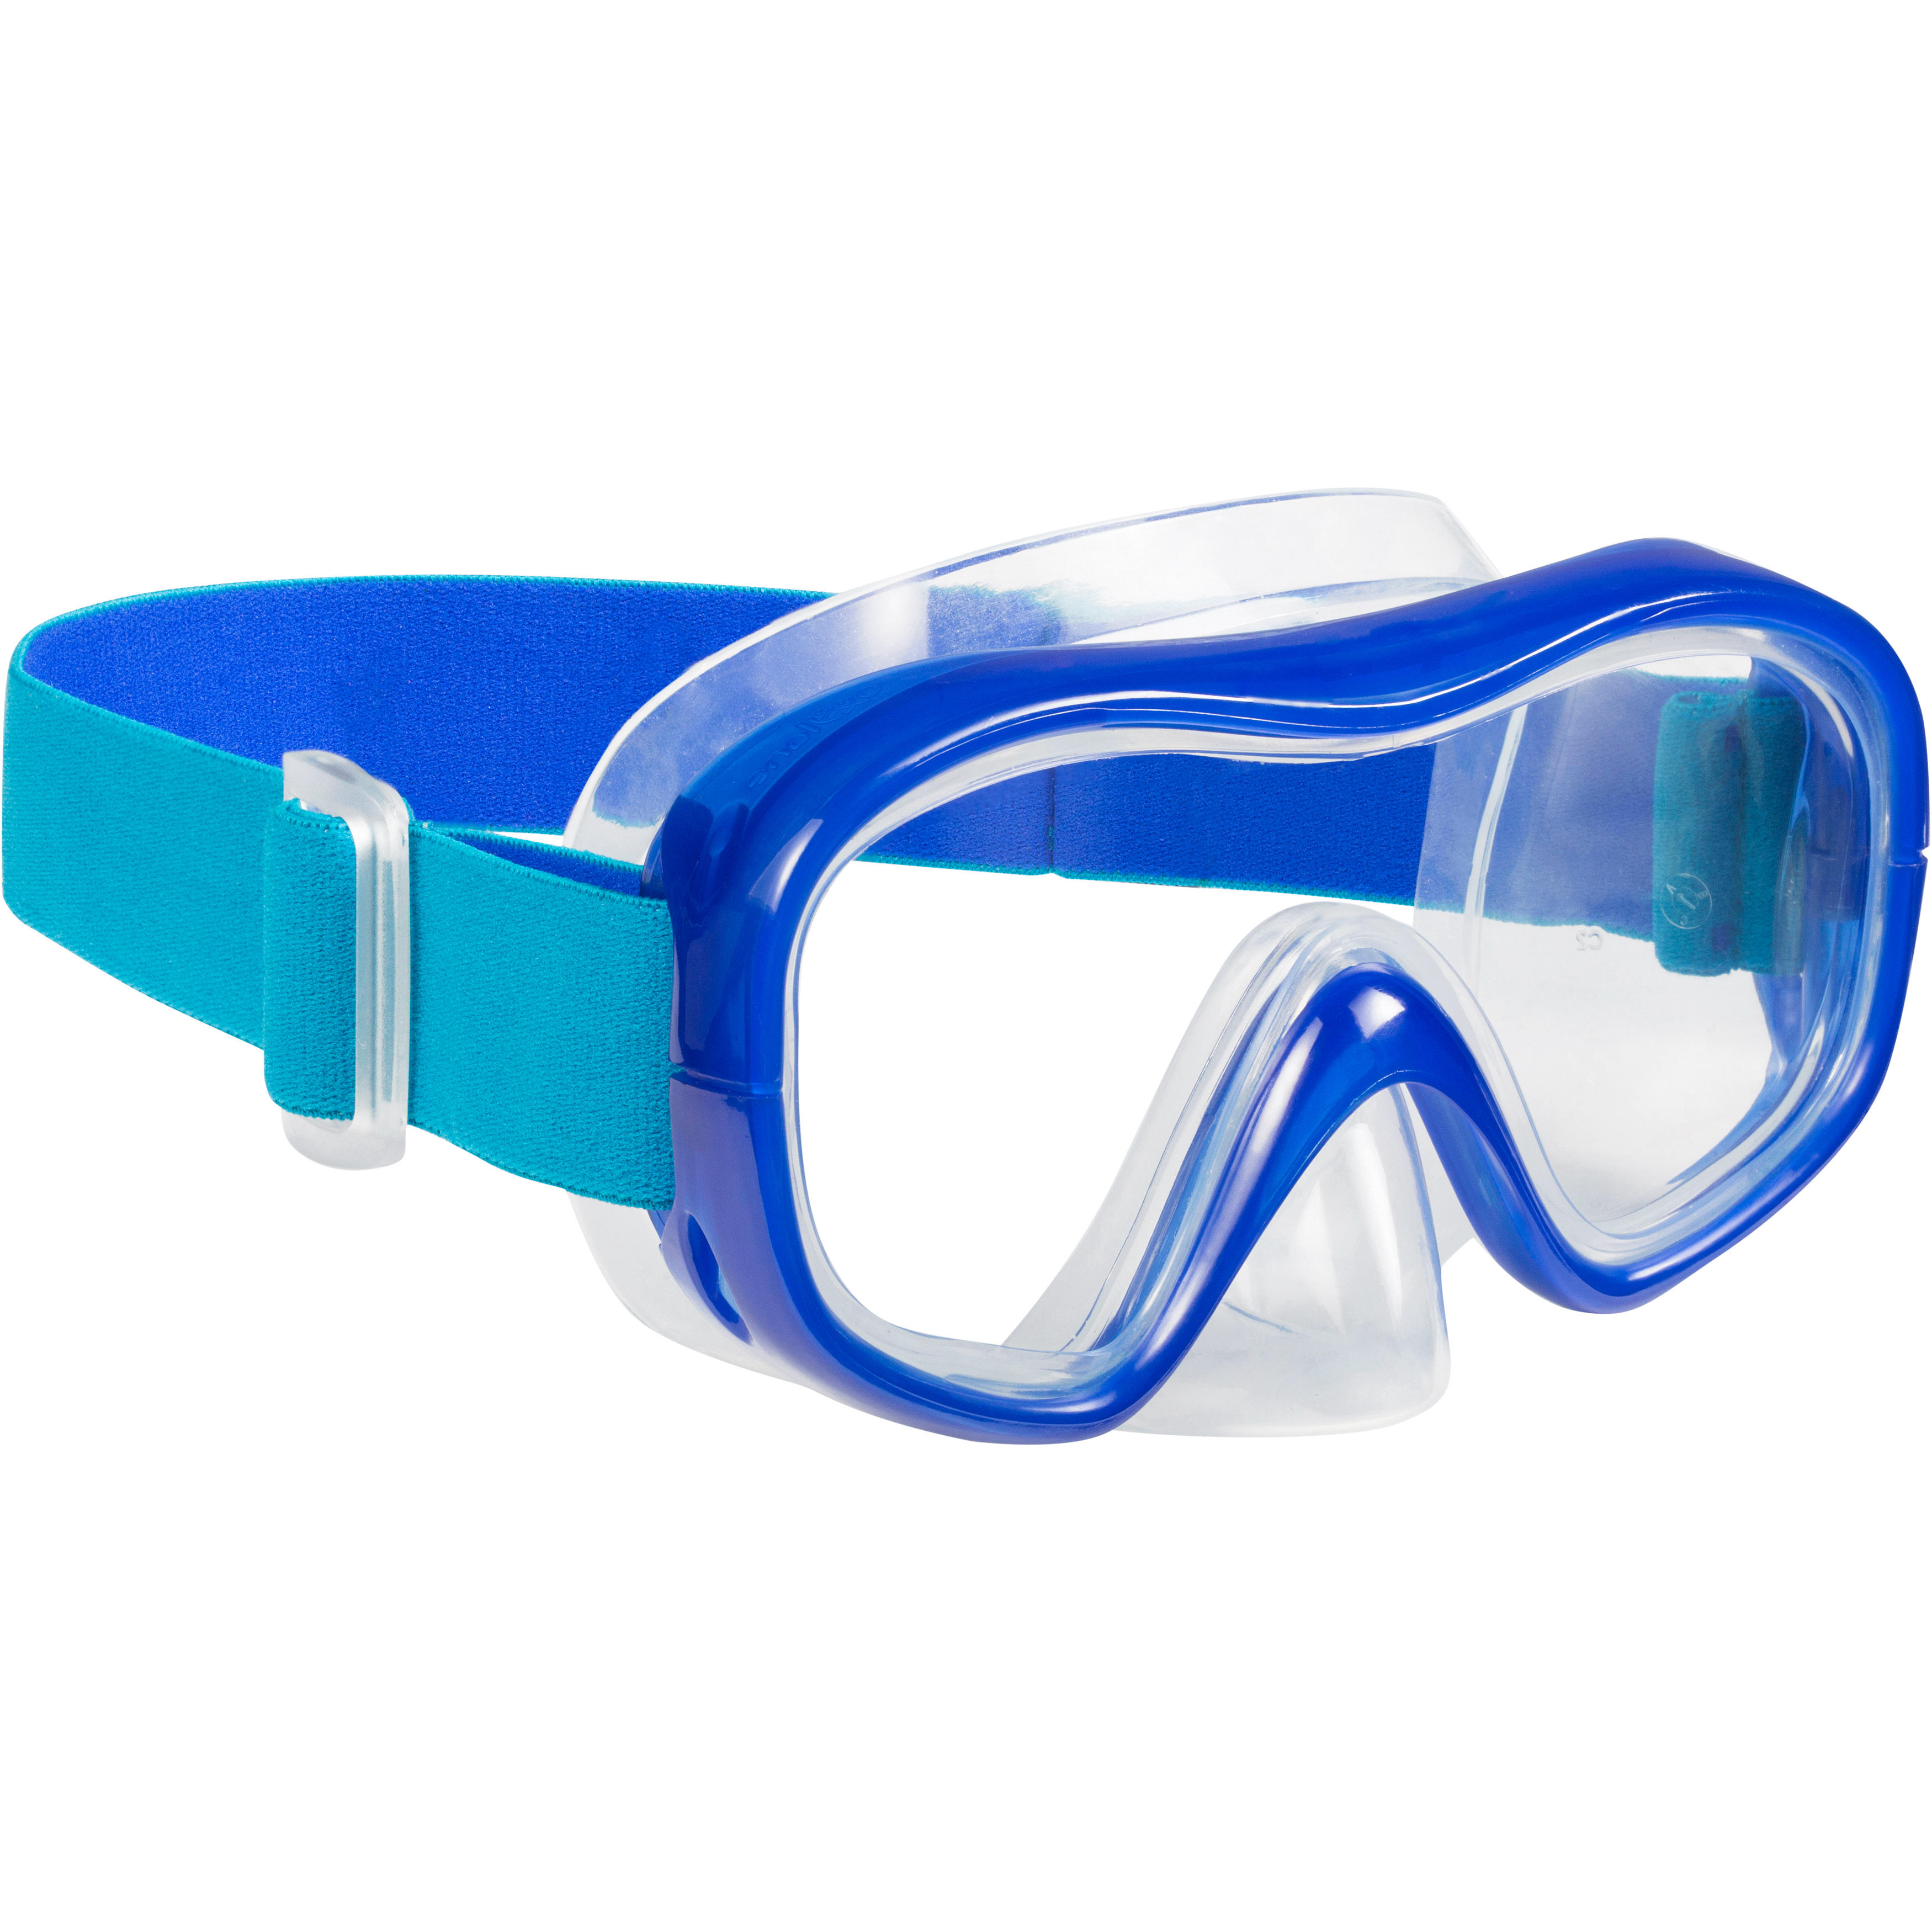 SNK 520 Snorkeling Mask blue